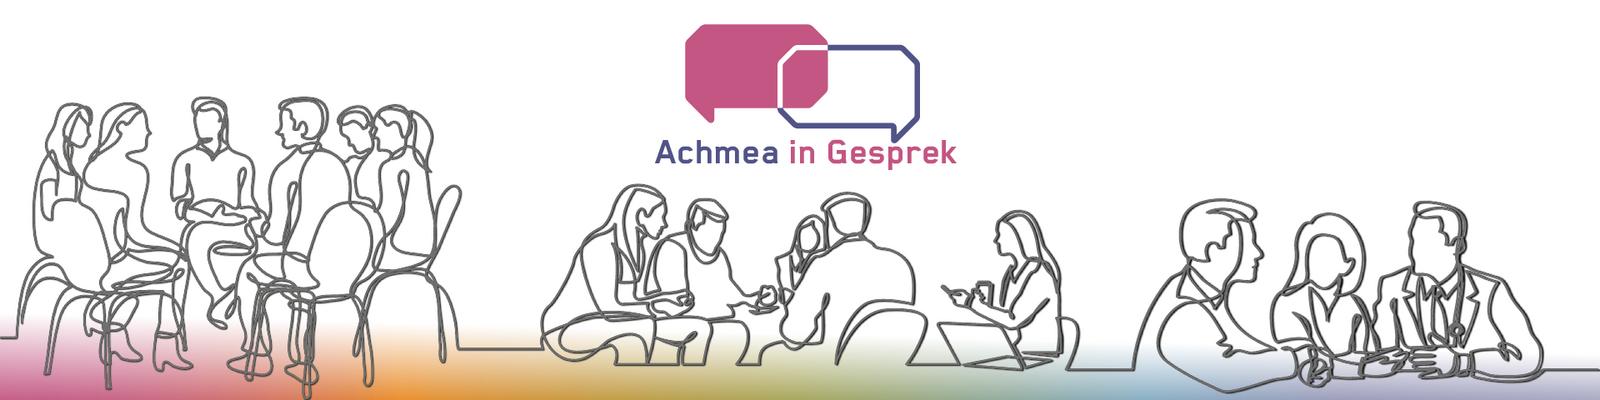 Achmea In Gesprek 2019